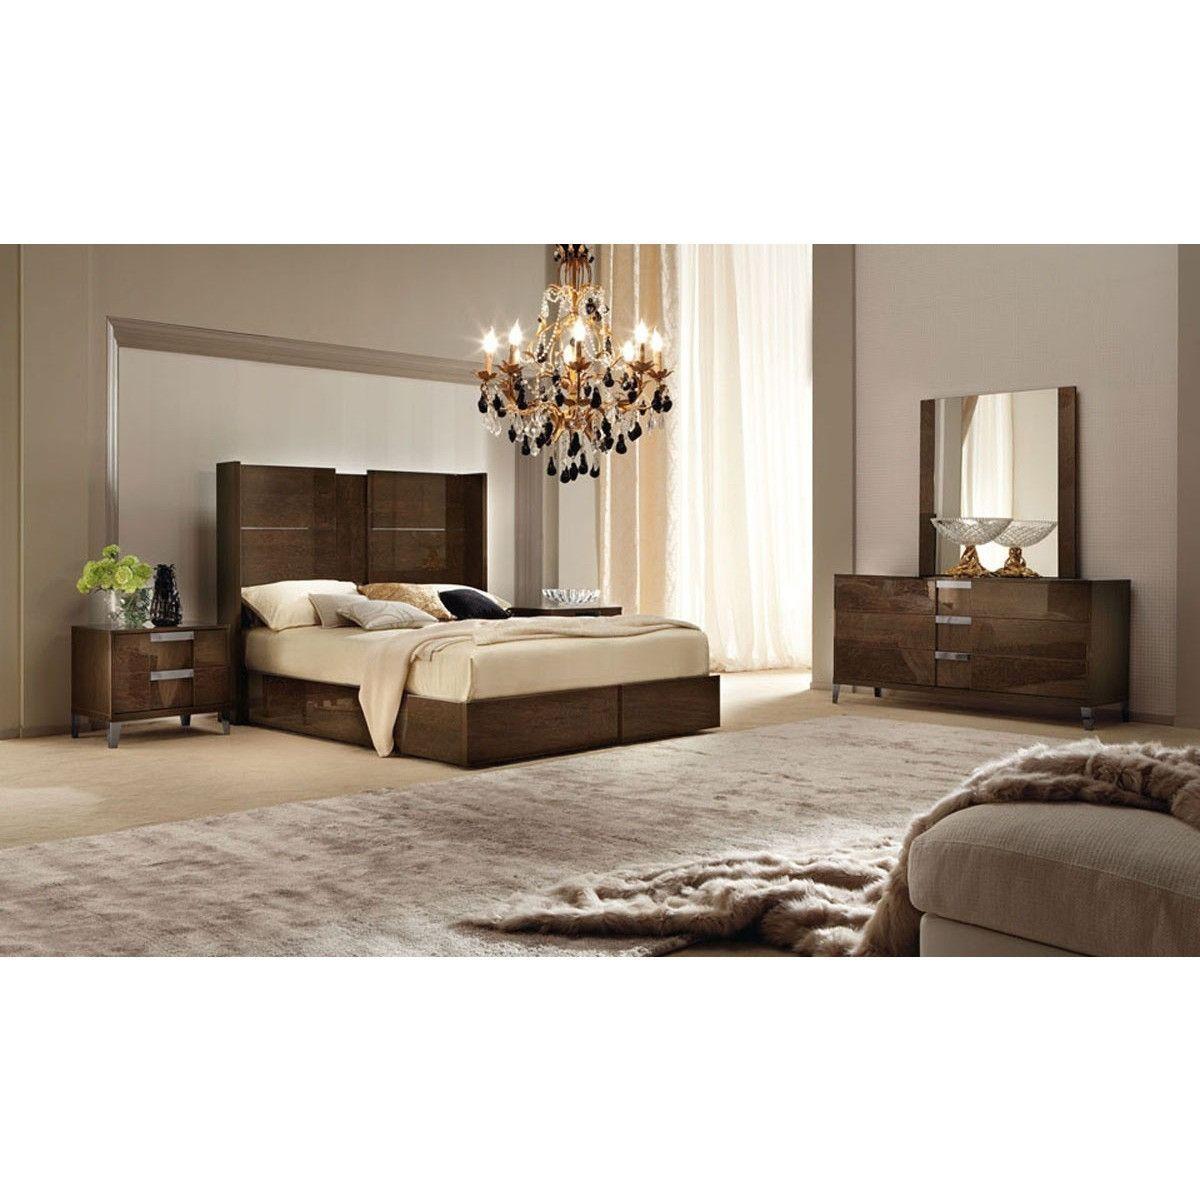 Alf Soprano Italian Modern Bedroom Set With Storage Drawer Prepossessing Bedroom Sets With Storage 2018